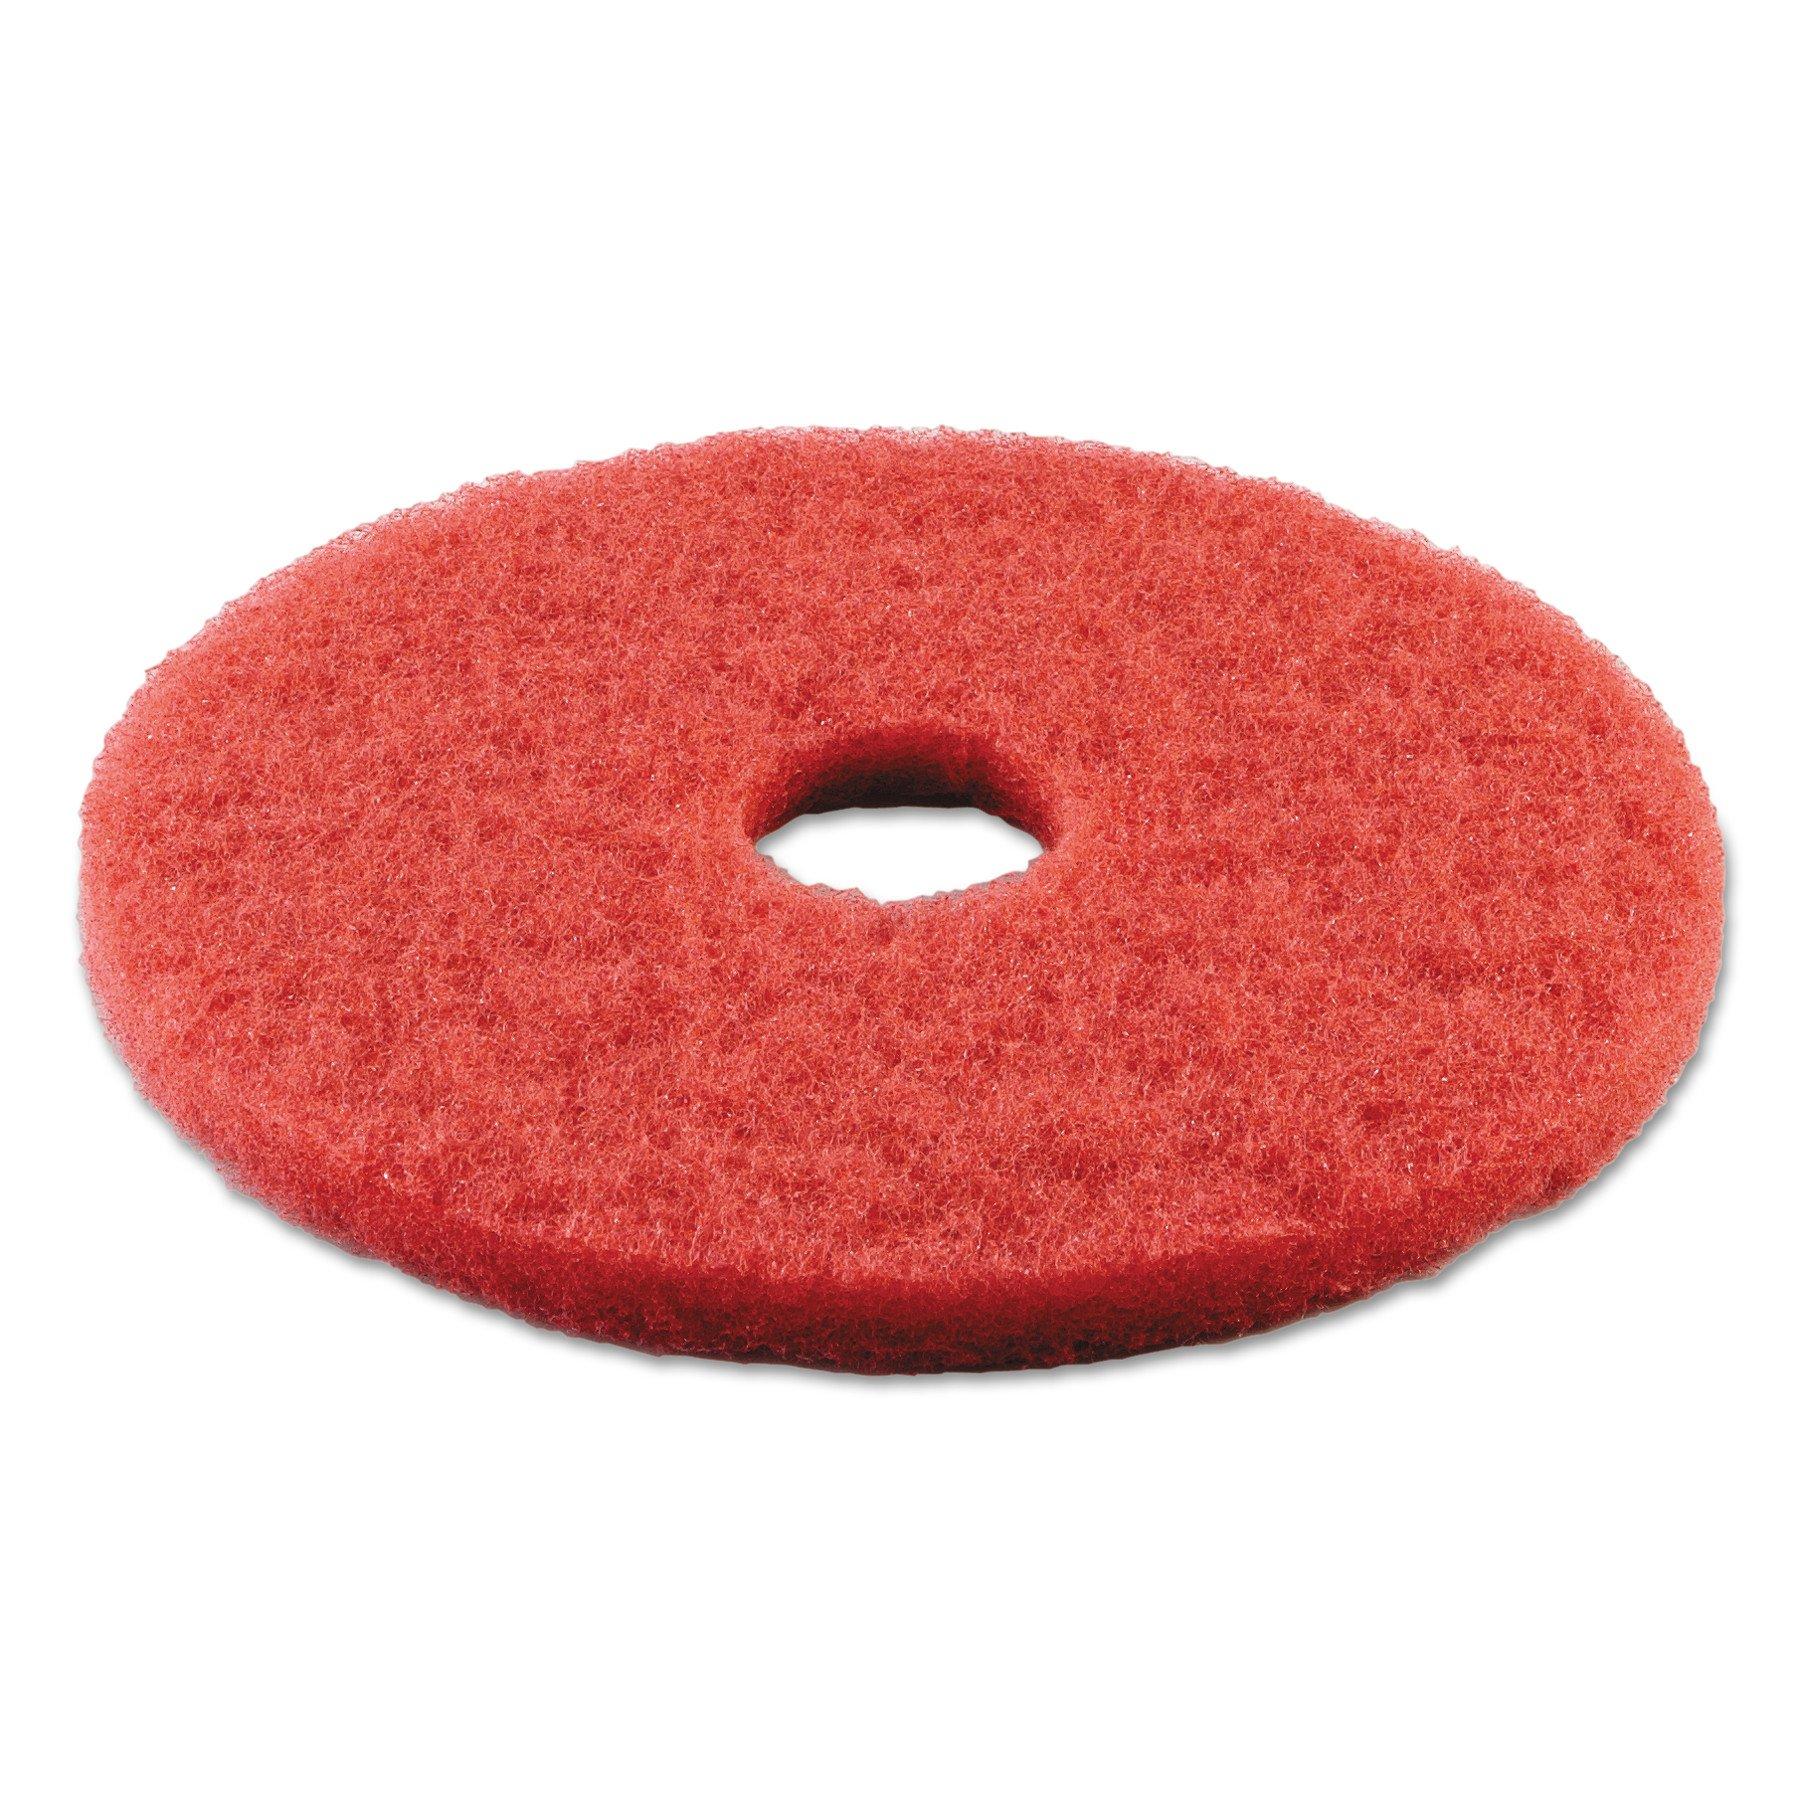 Boardwalk 4014RED Standard Buffing Floor Pads, 14'' Diameter, Red (Case of 5)